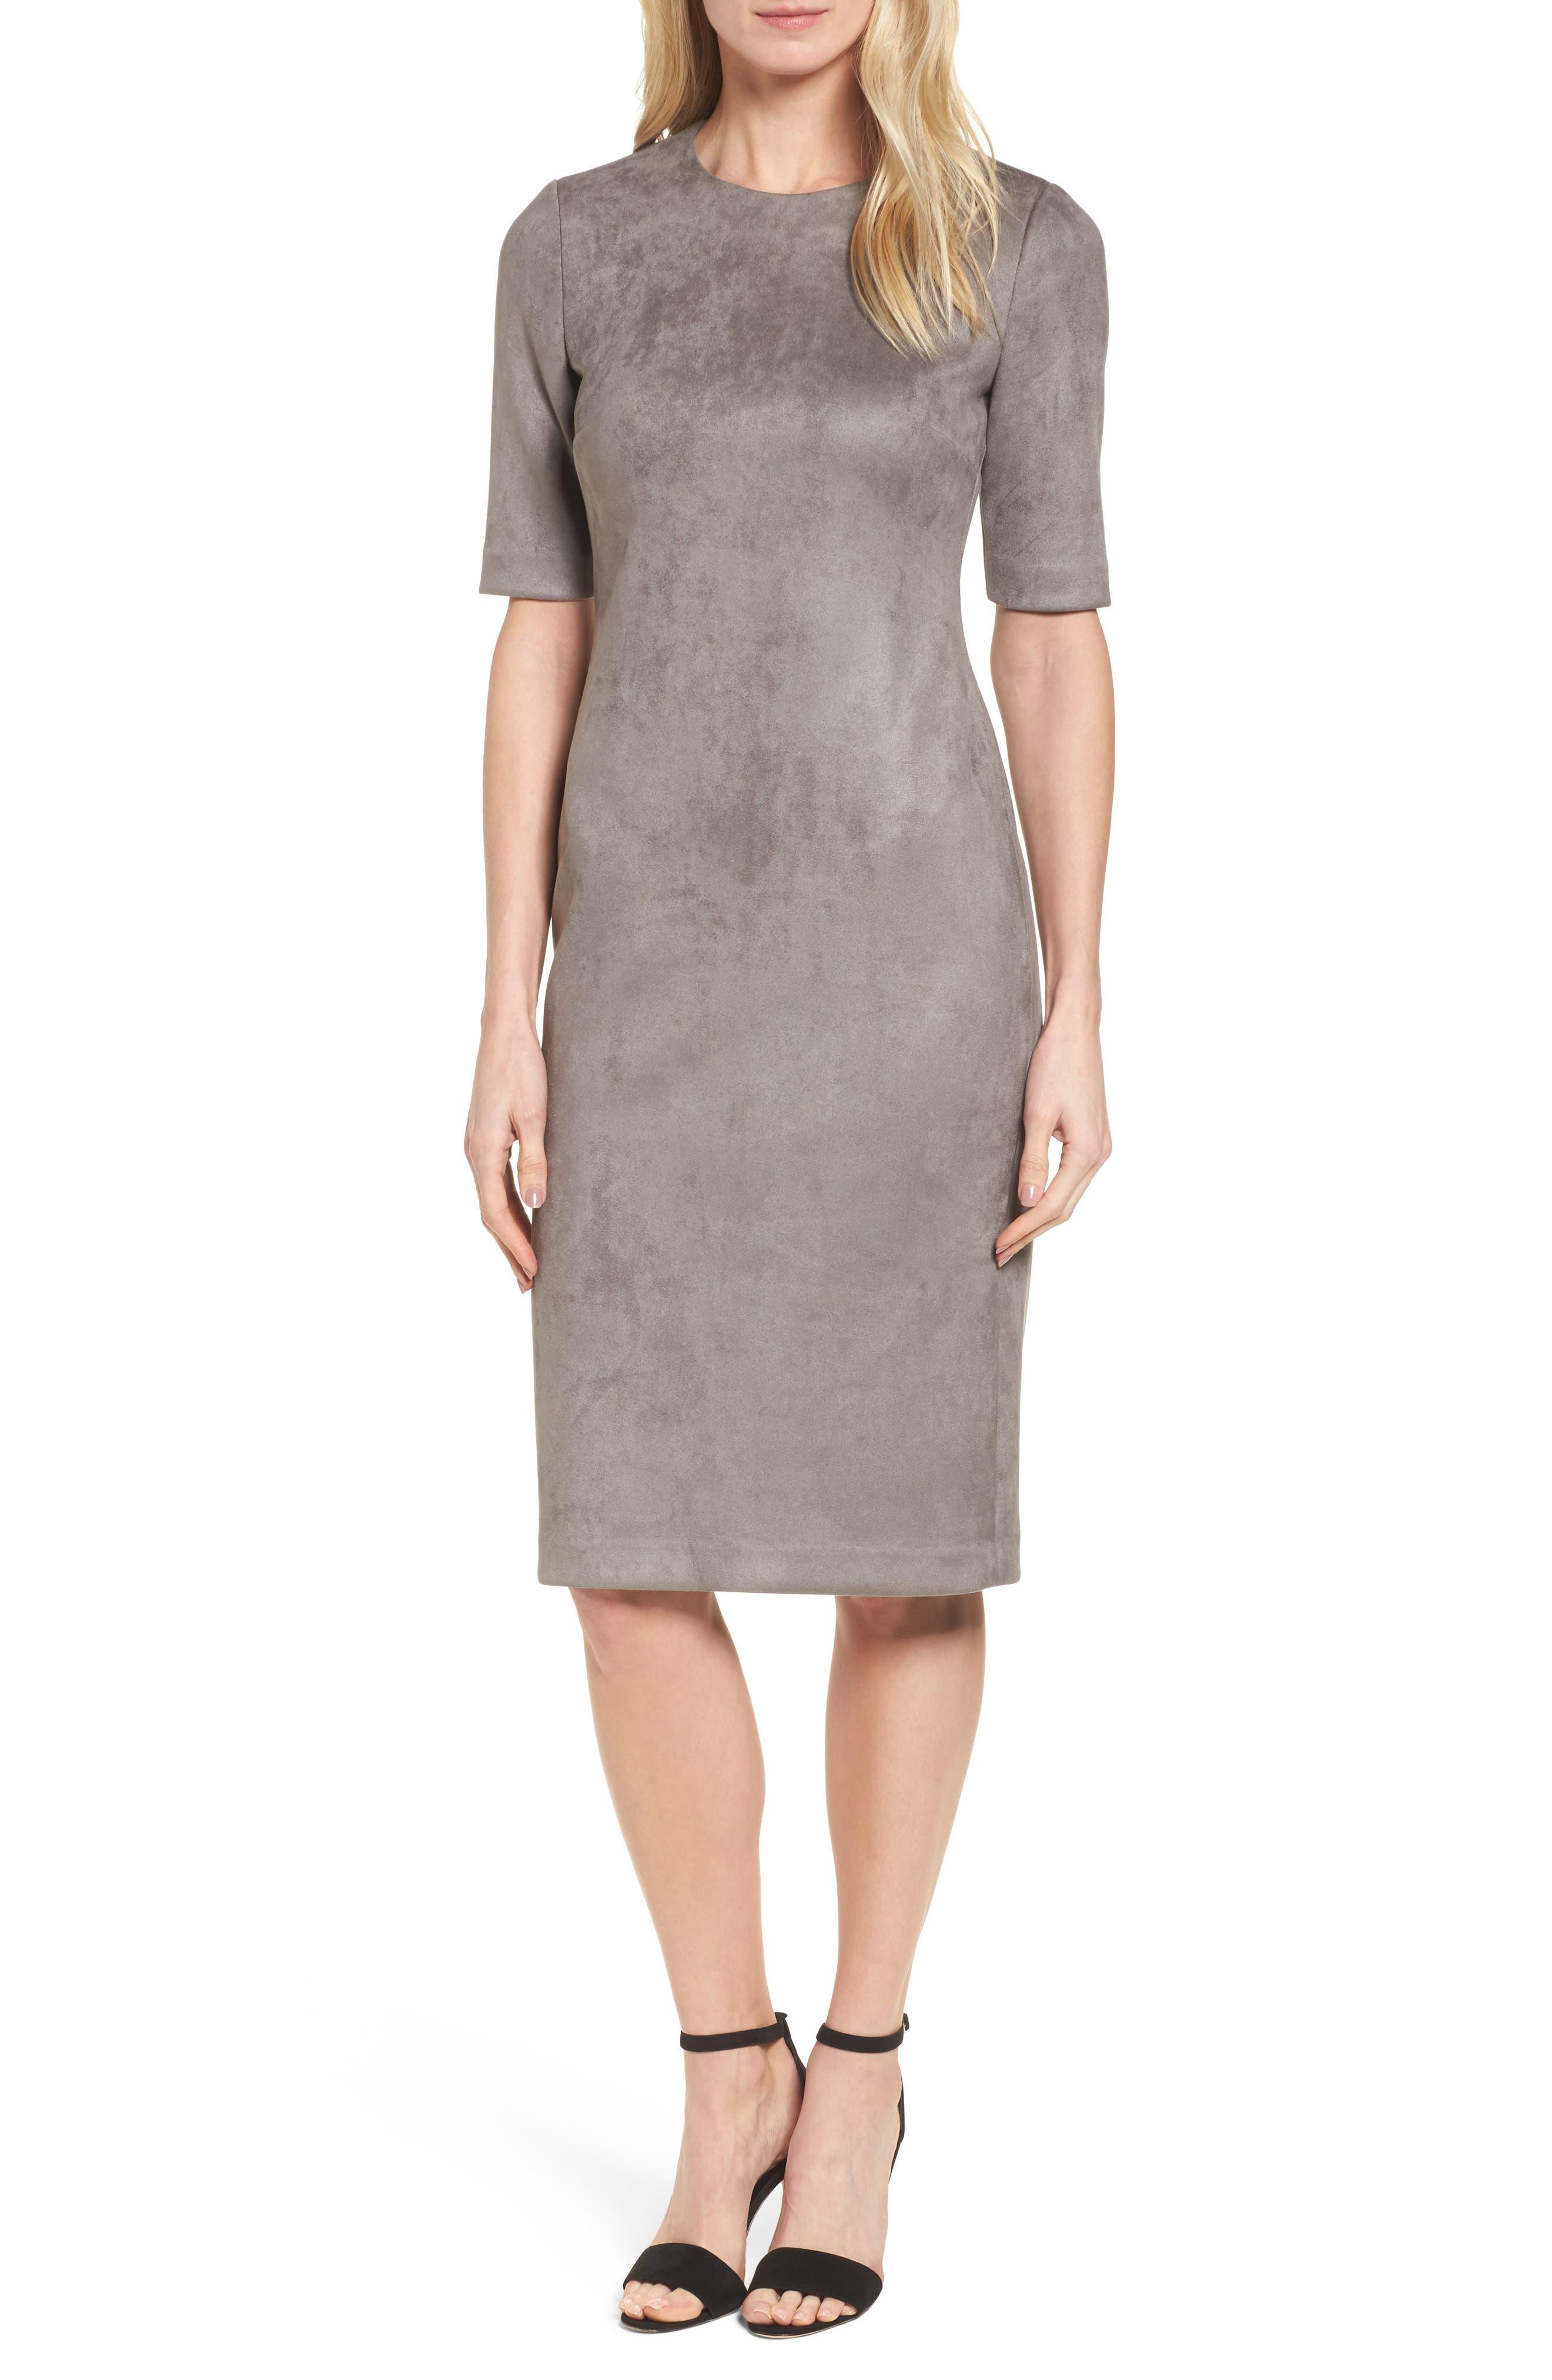 Alternate Image 1 Selected - Anne Klein Scuba Knit Sheath Dress